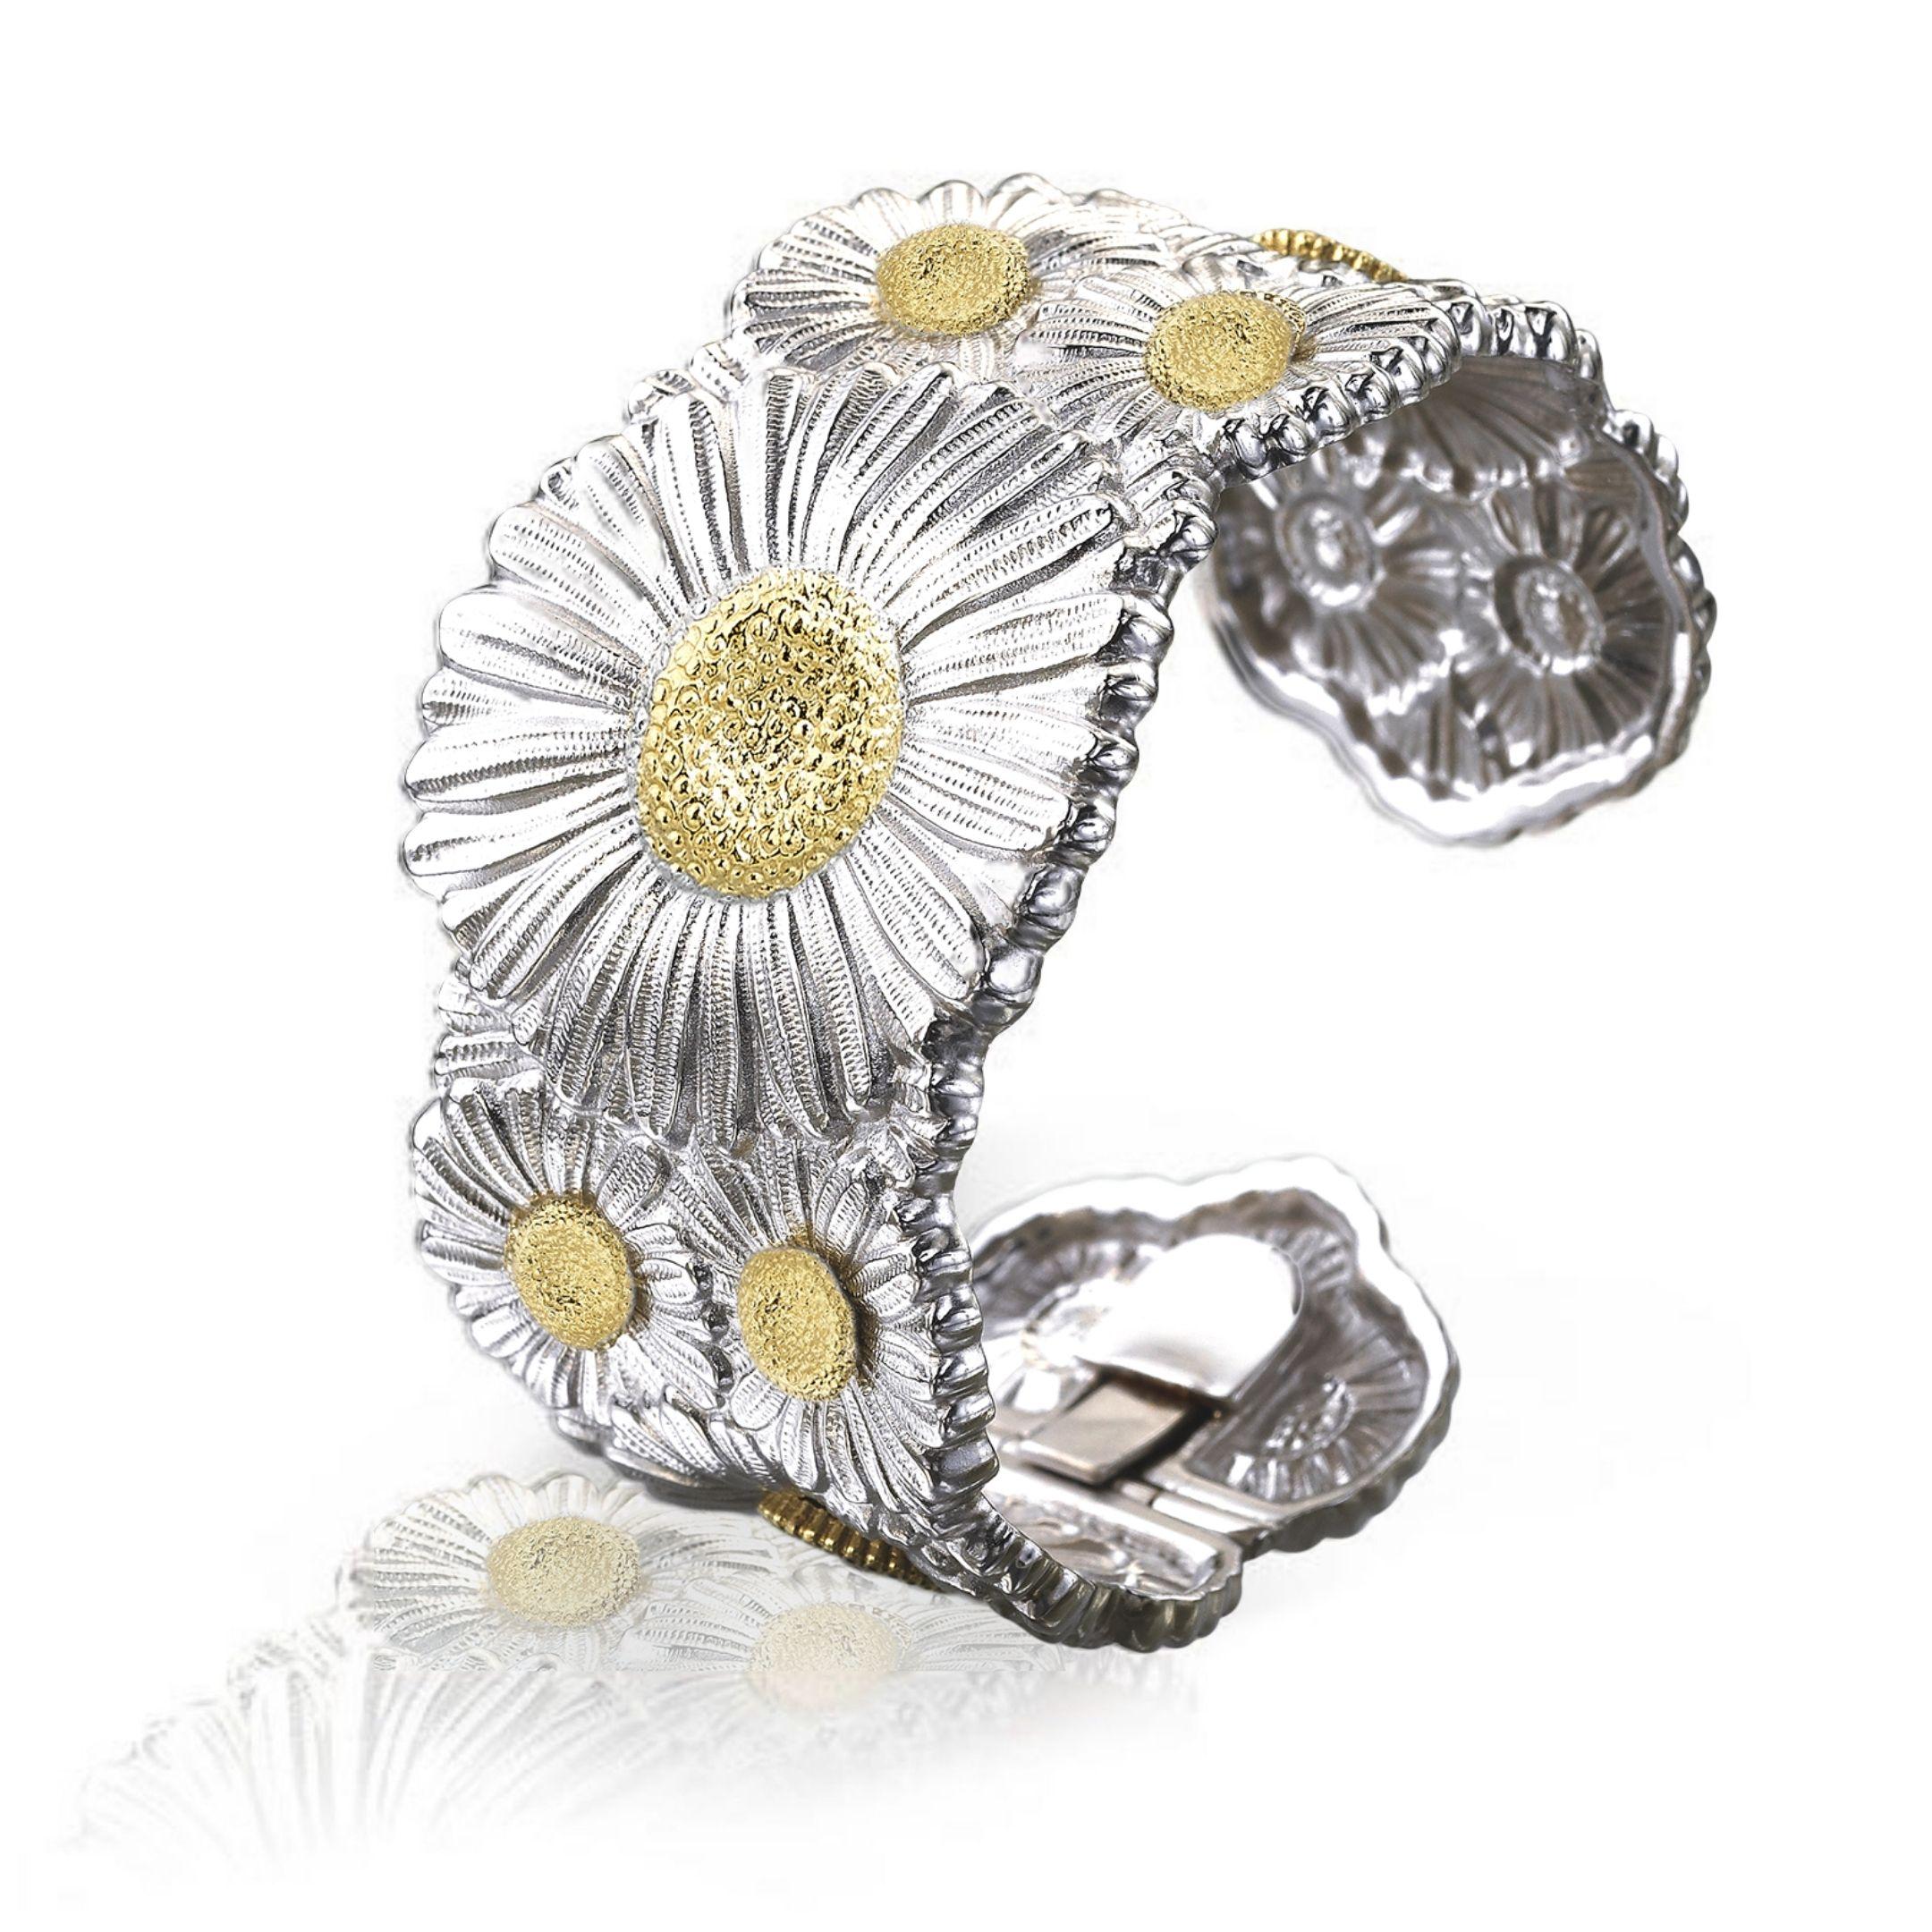 Bracciale cuff Daisy Buccellati Bracelet sconto discount